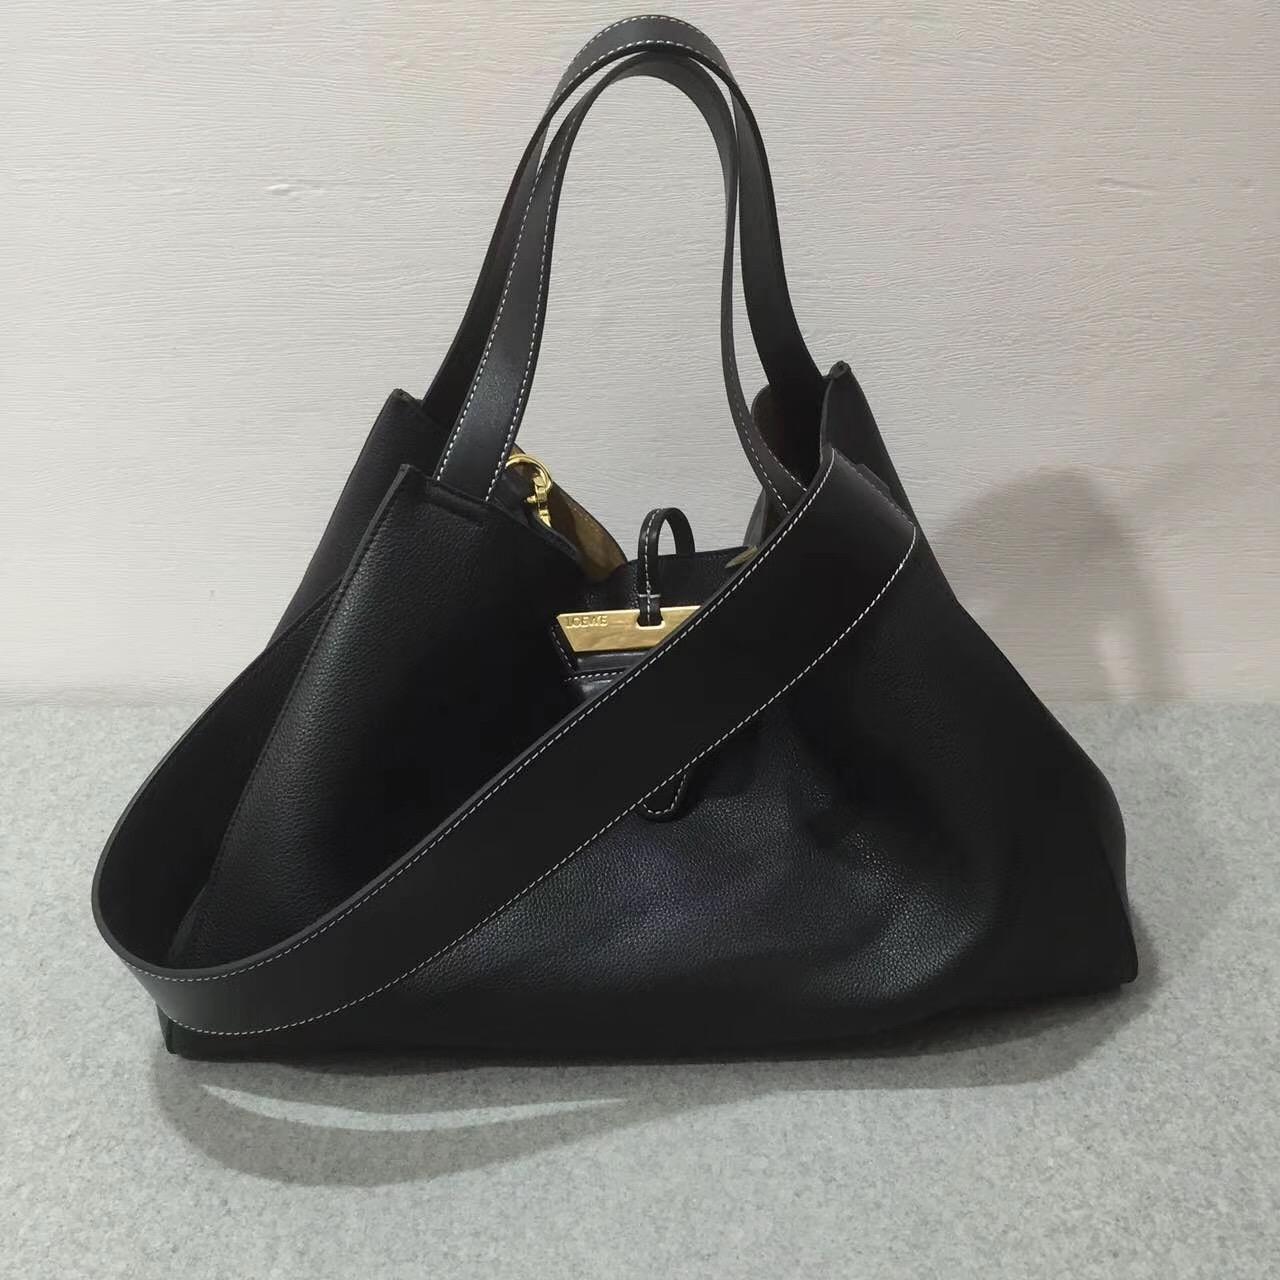 loewe羅意威巴塞羅那包 Barcelona Tote Bag 黑色